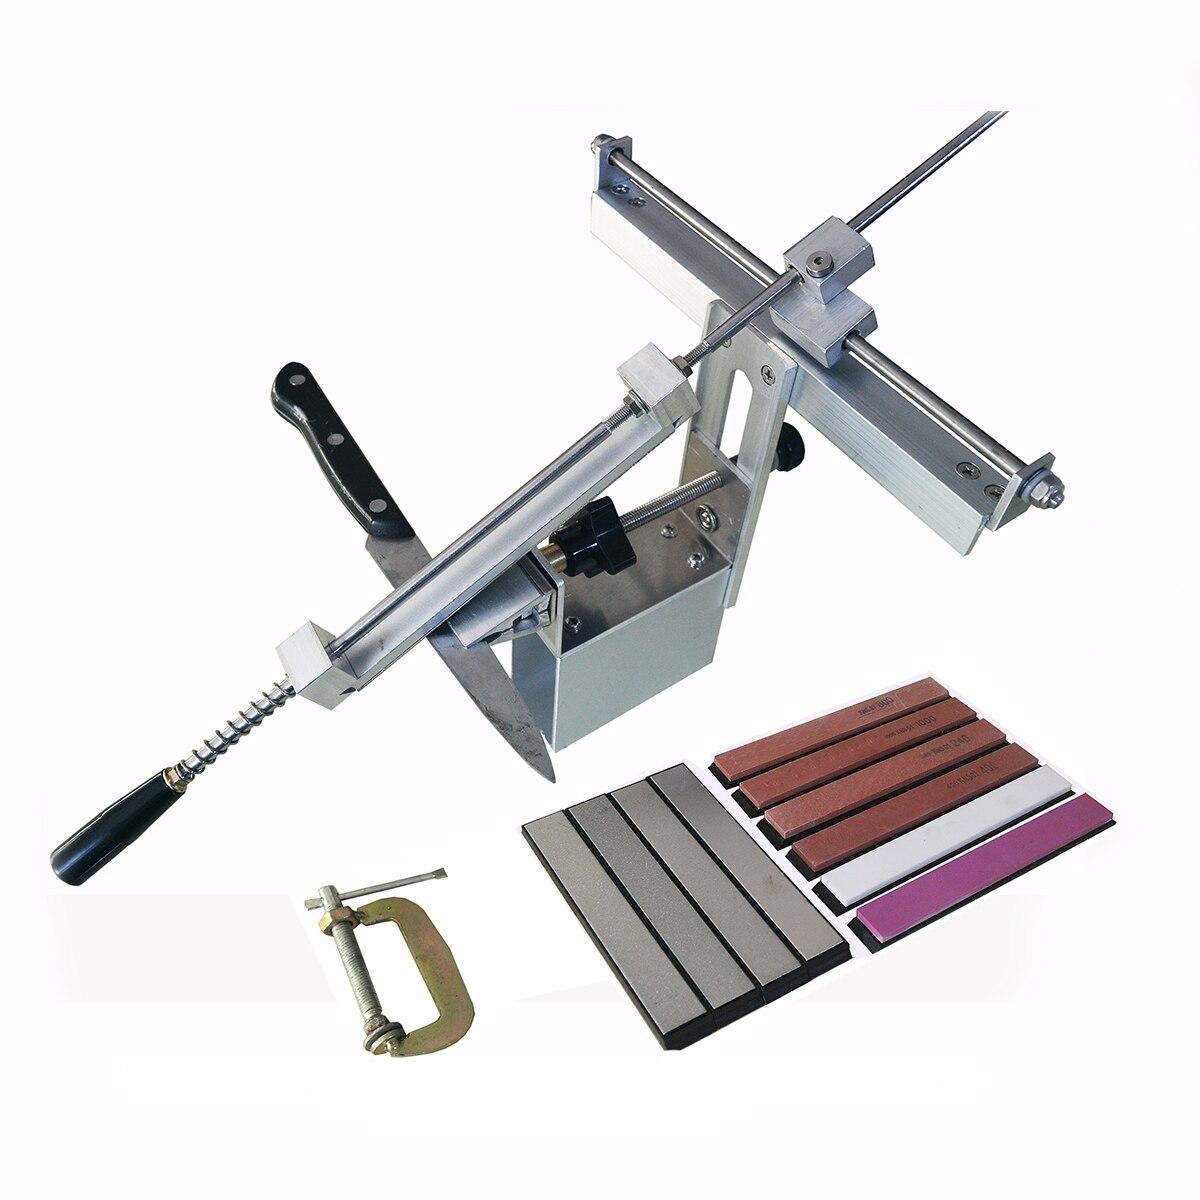 KME II knife sharpener Professional Grinder for sharpening Profession knife Grinding system Apex edge knife sharpener